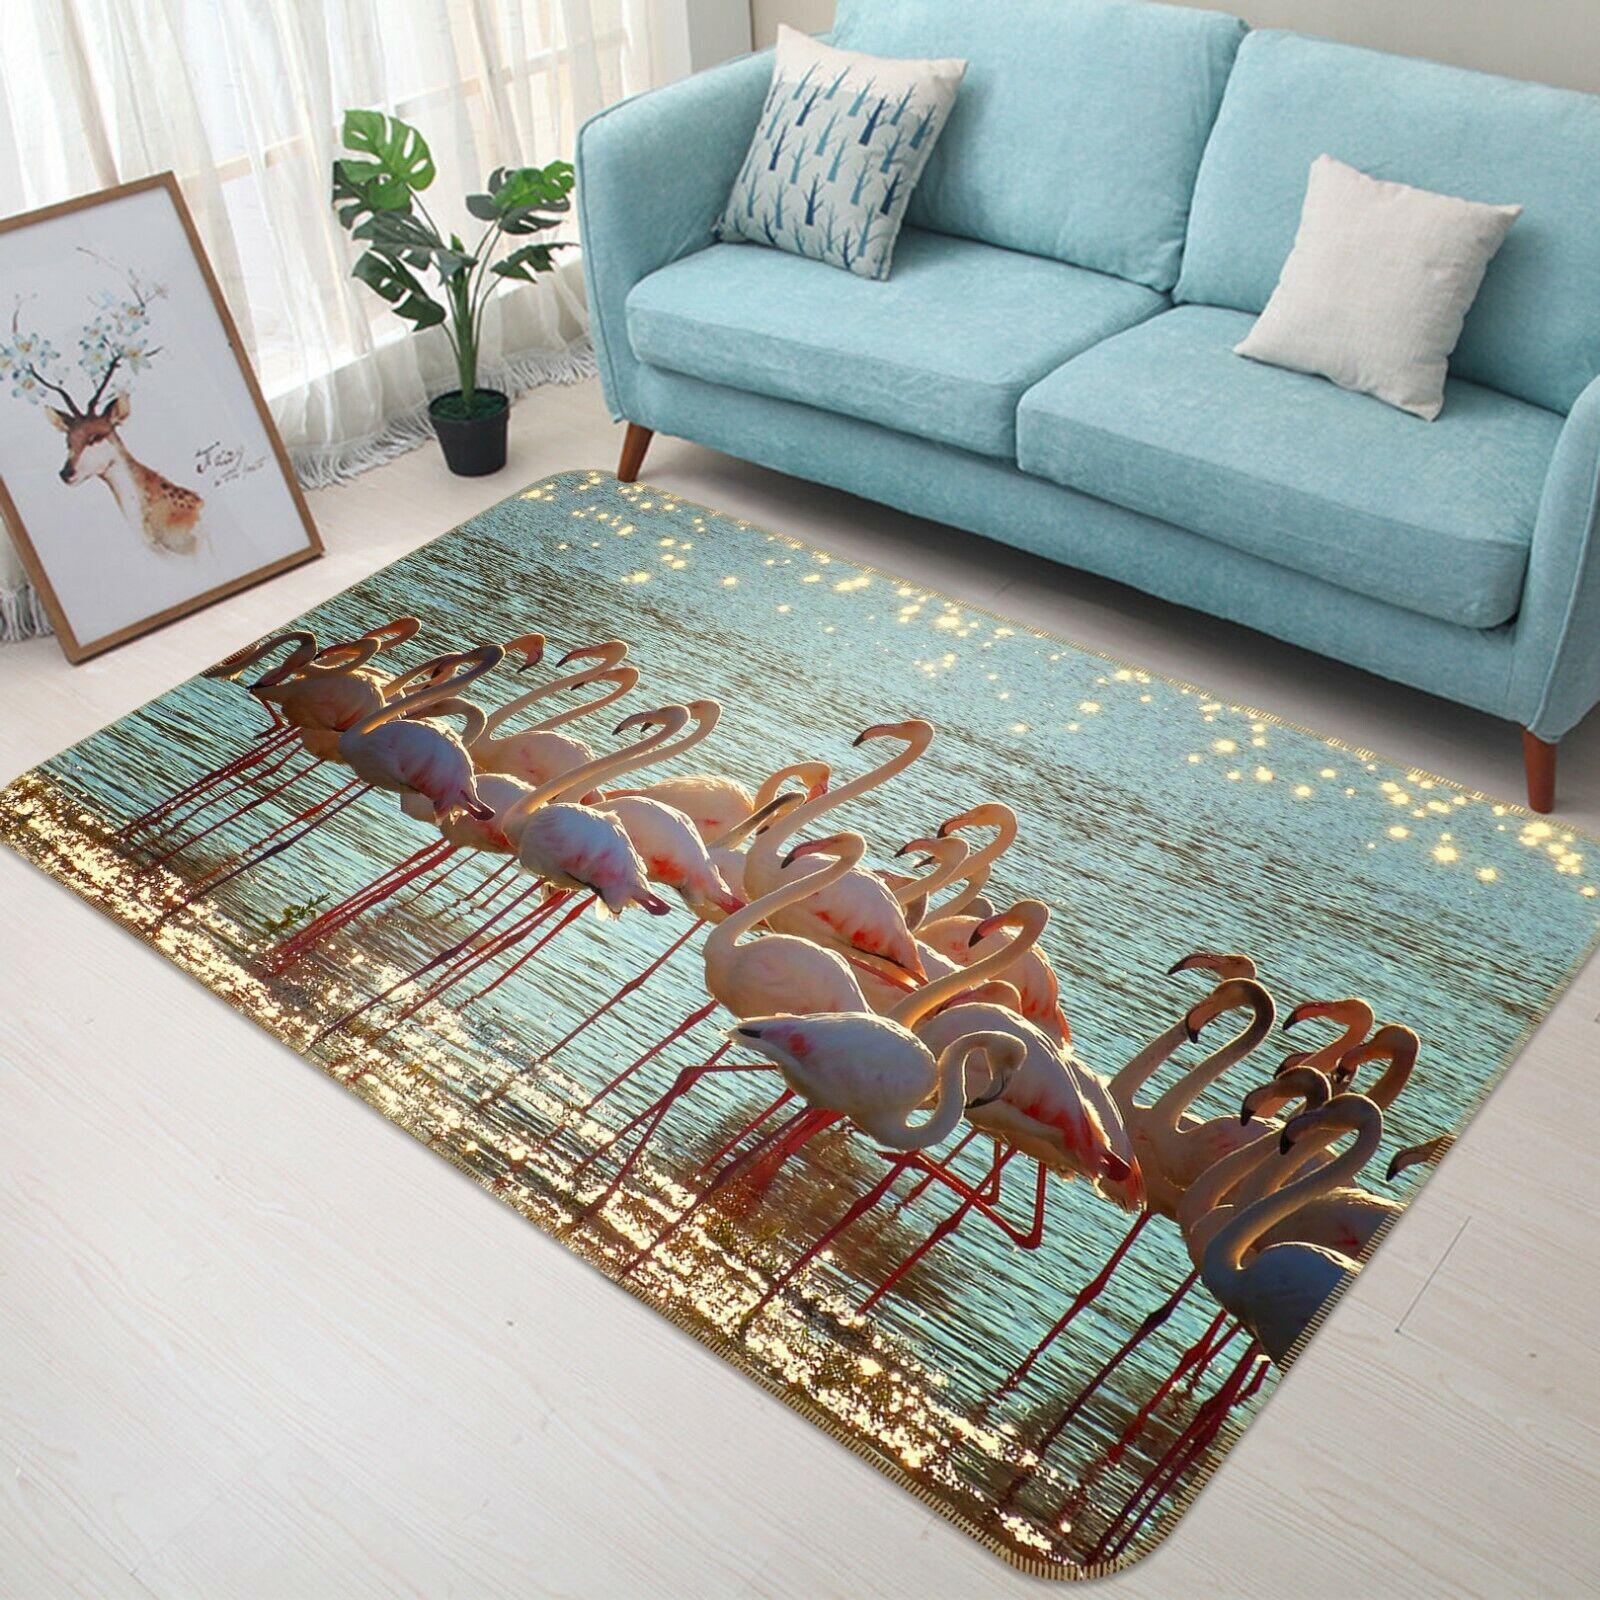 3D Fenicotteri Lake C055 Animale tappetino antiscivolo tappeto rossoondo elegante Tappeto Wendy